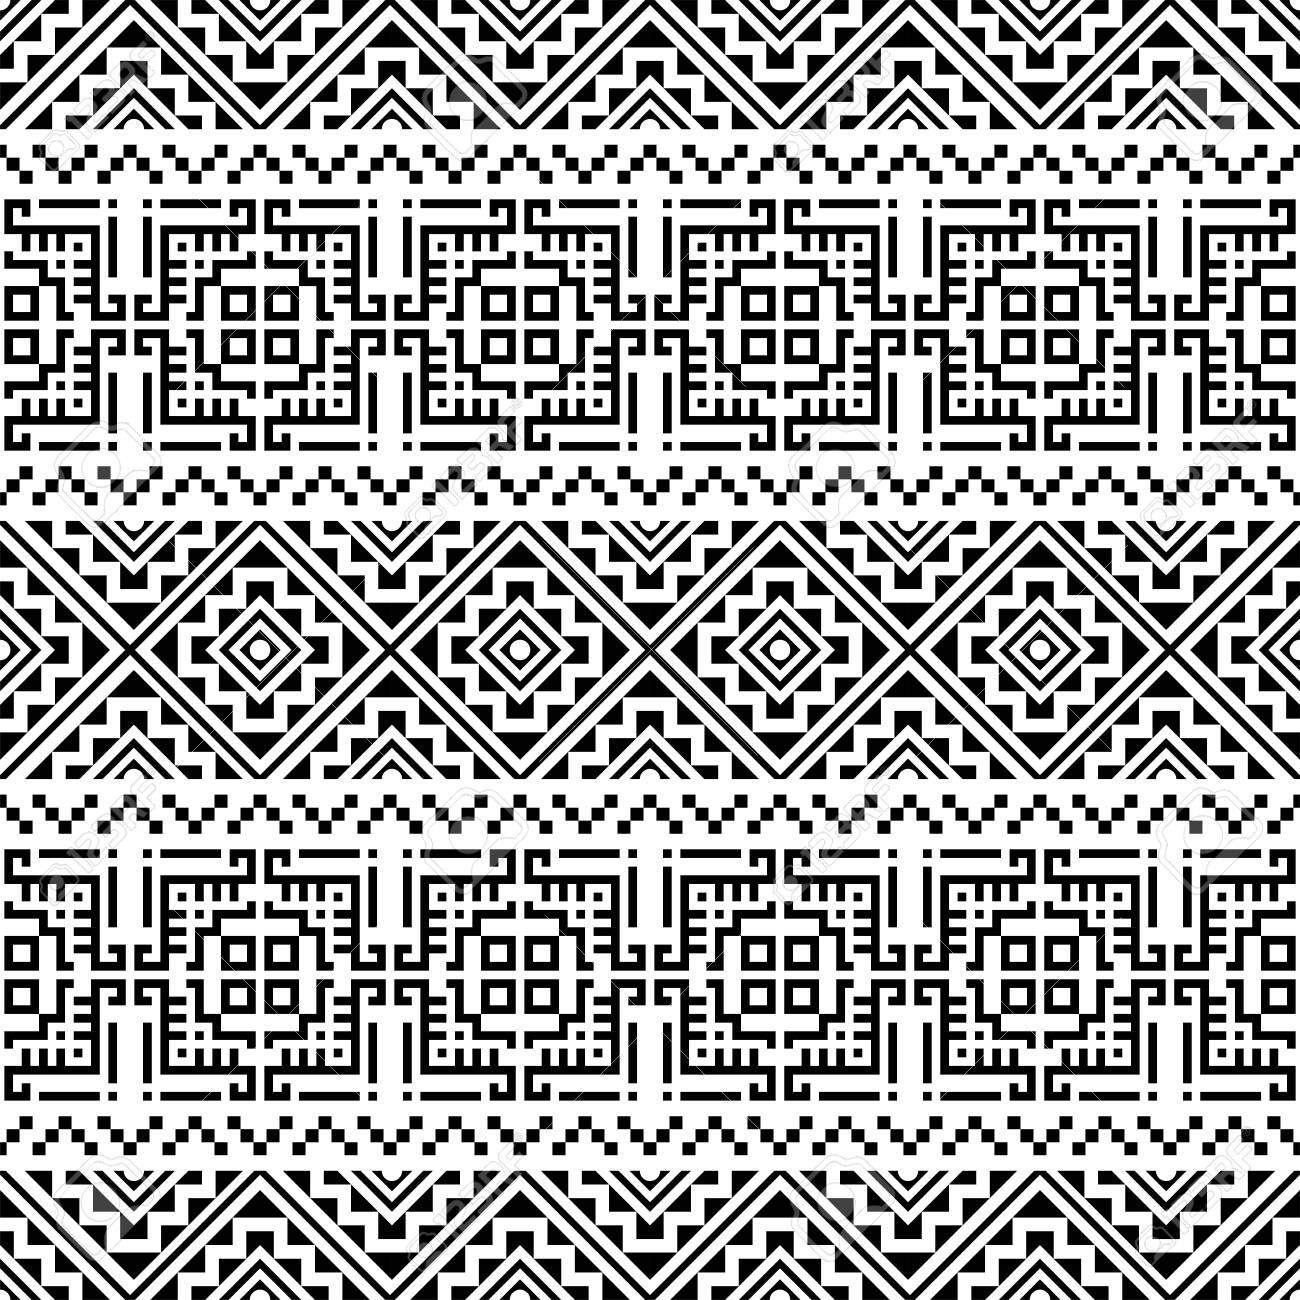 Aztec Seamless ethnic pattern design vector background - 141465709